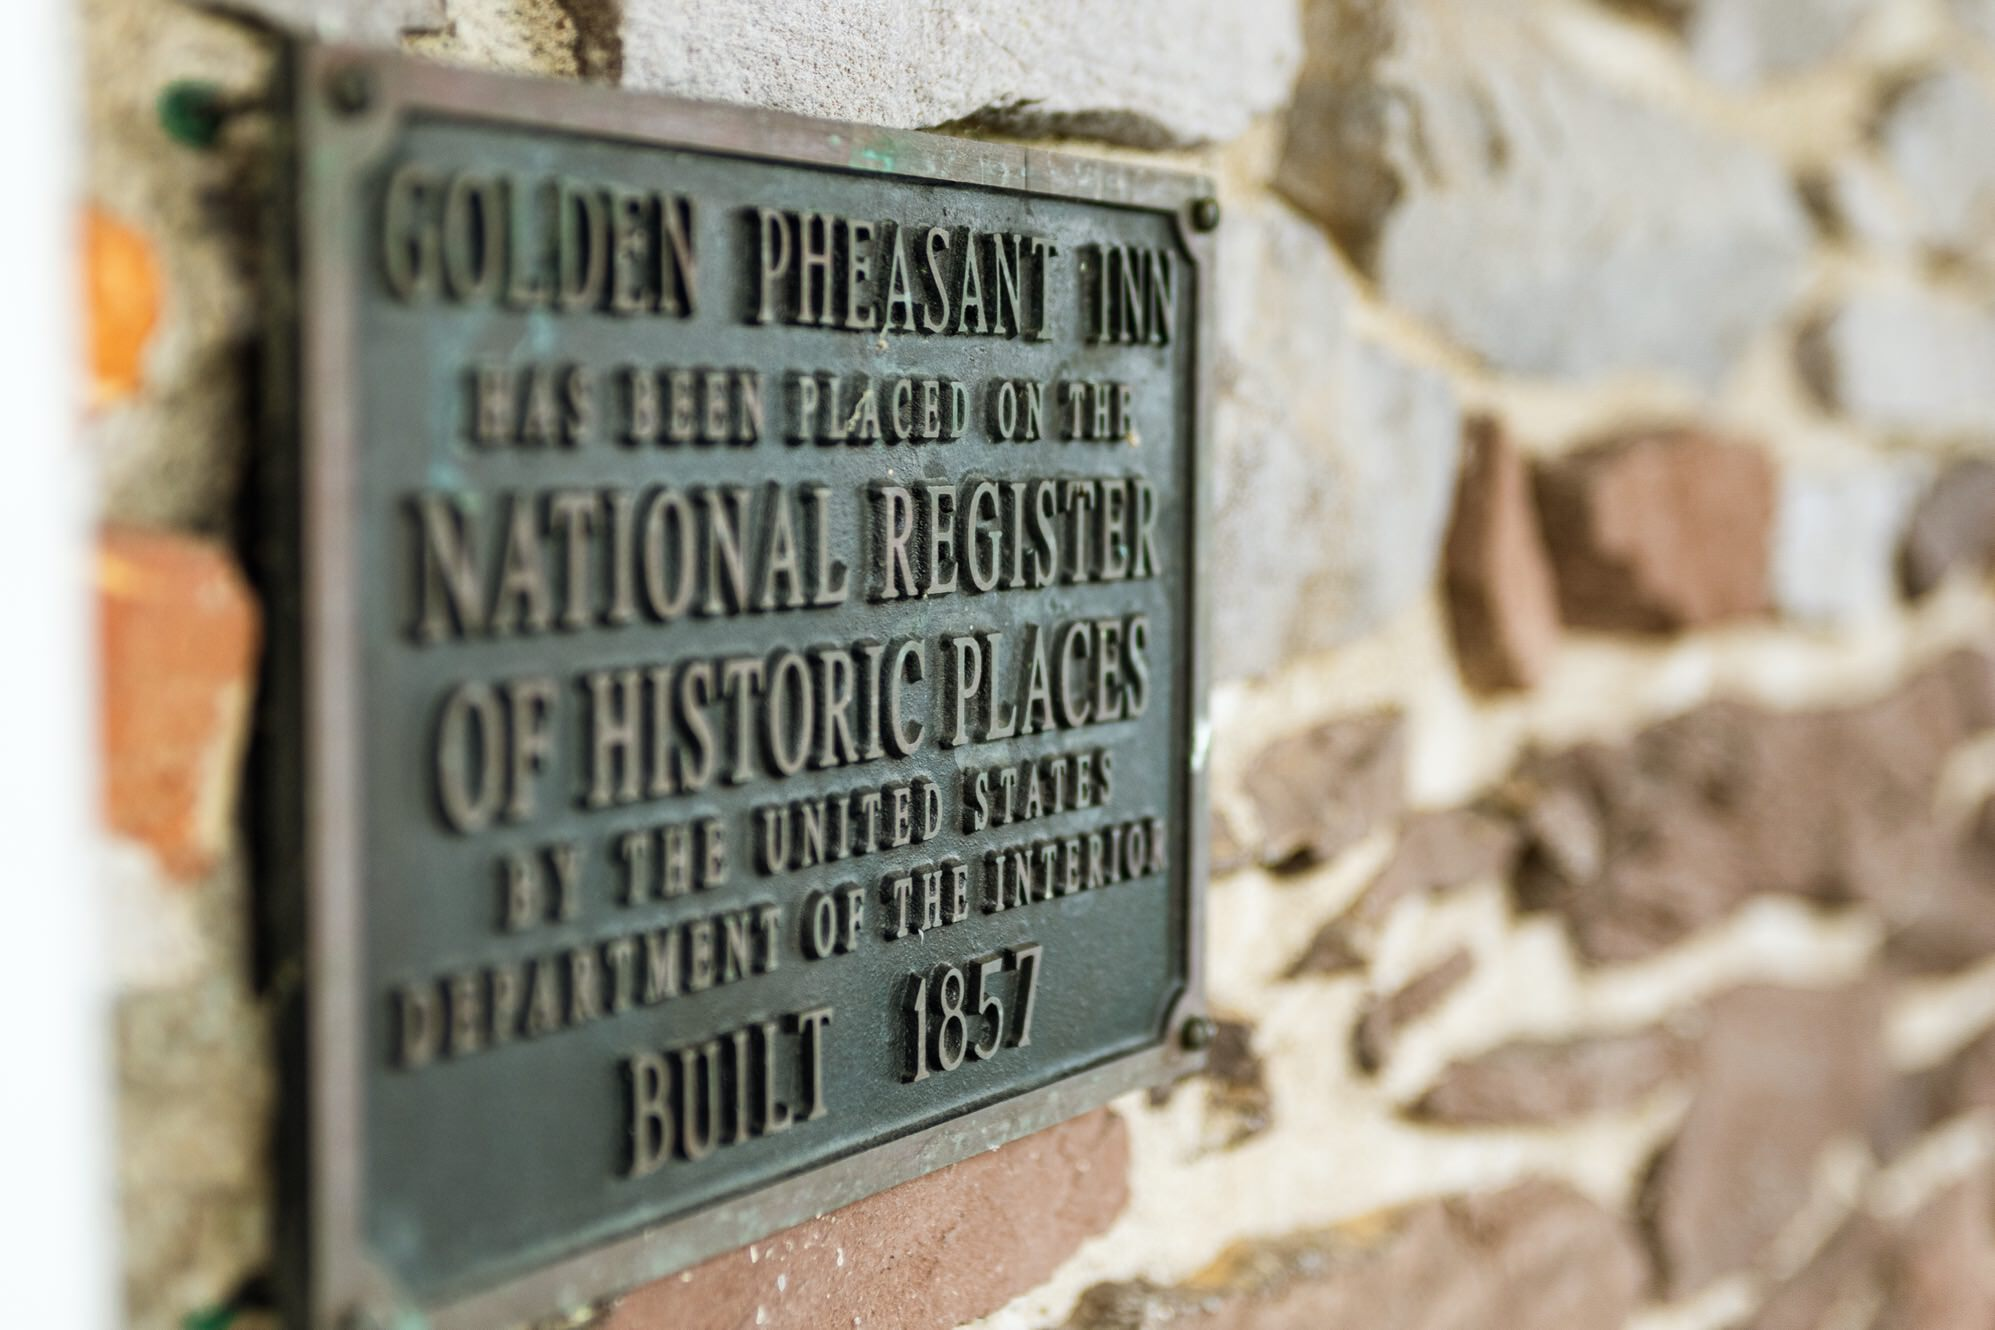 Golden pheasant national registry historic places